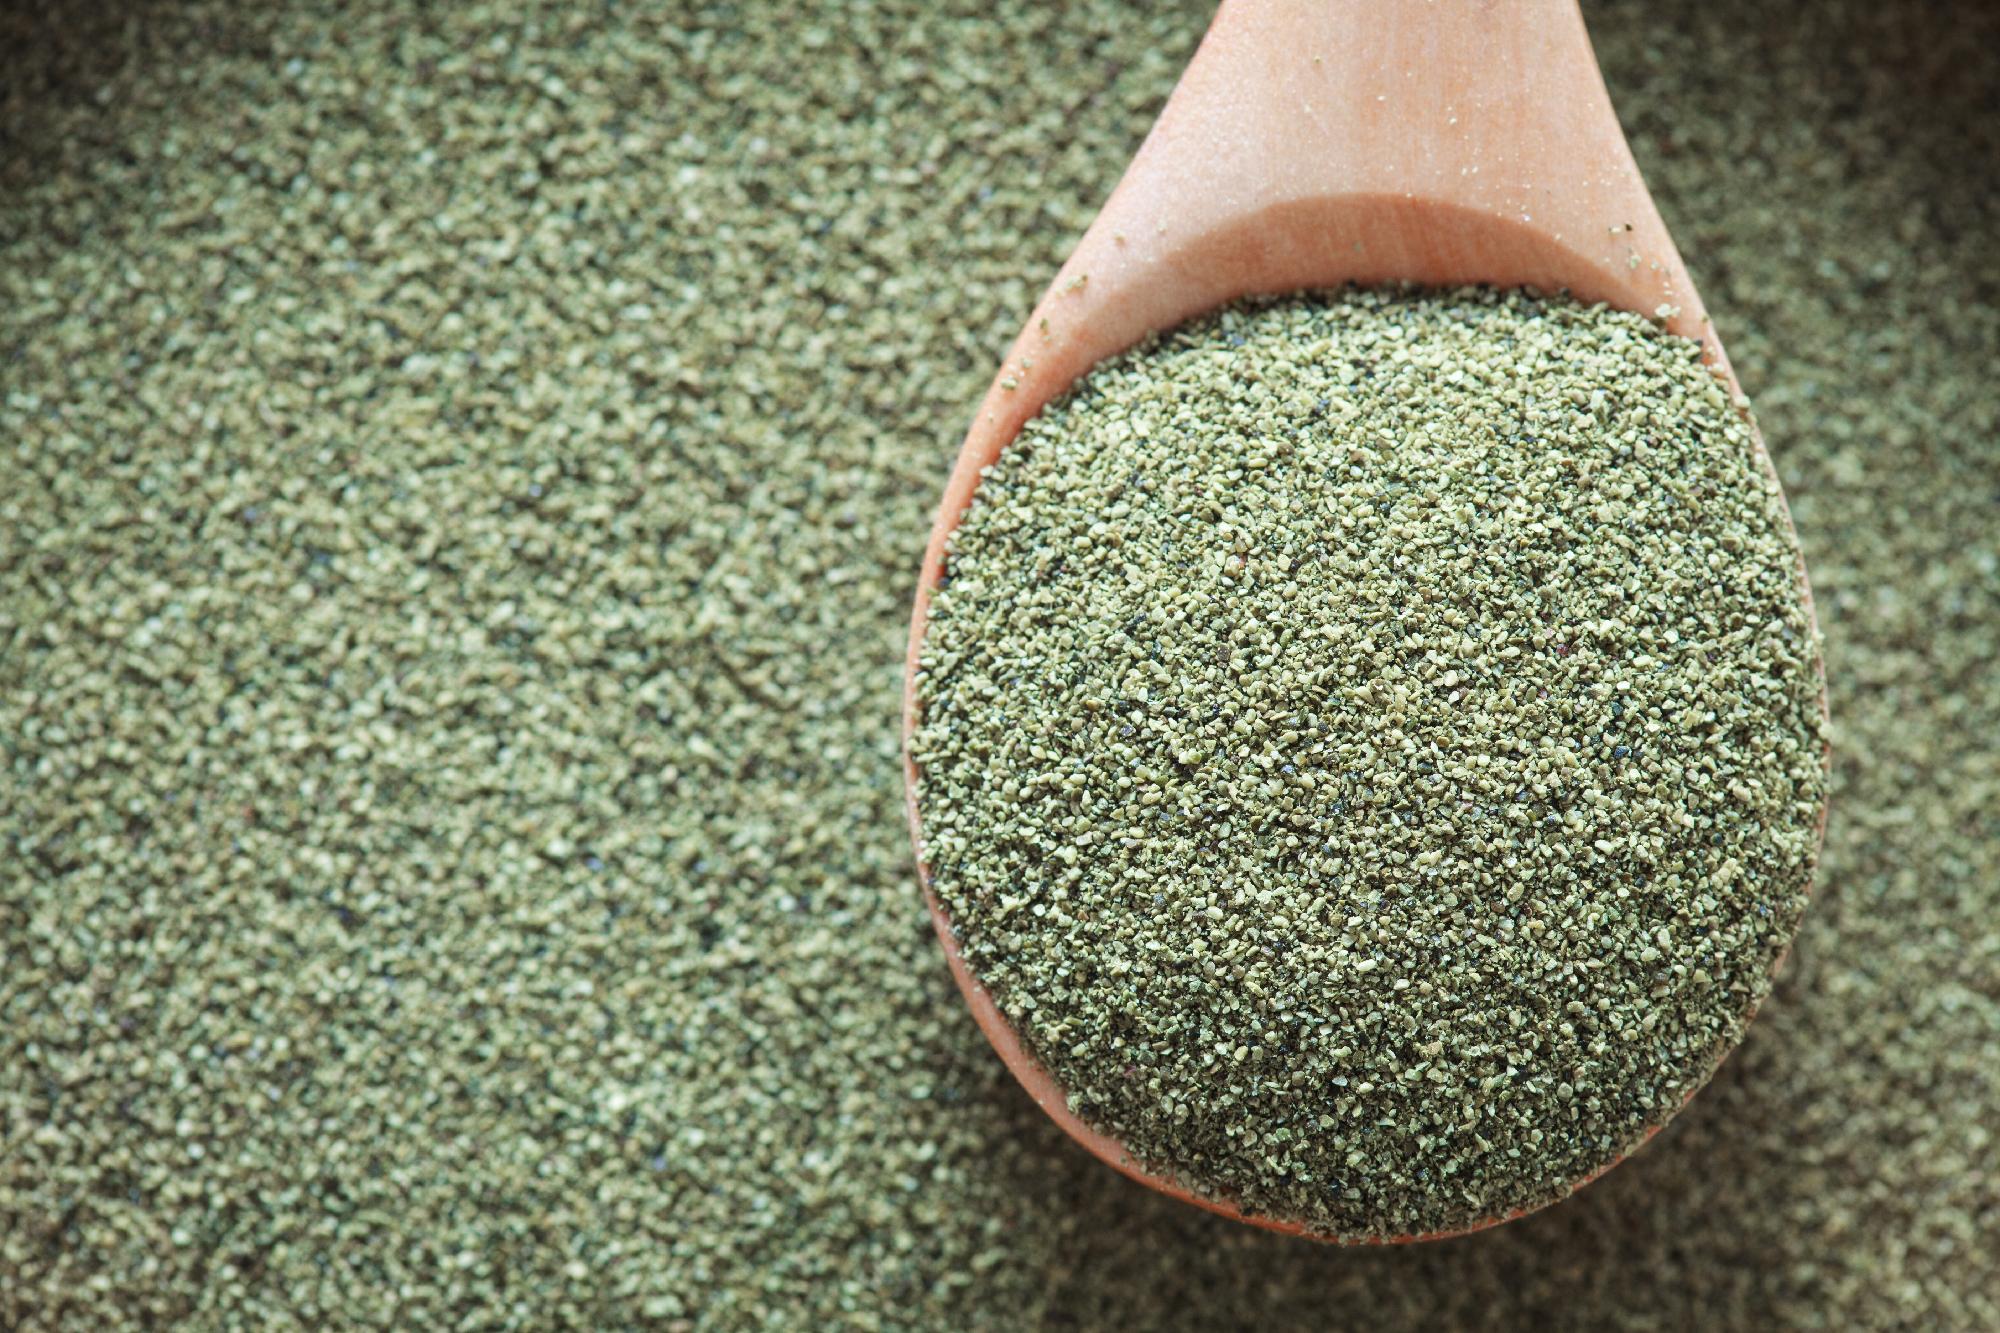 Moringa Improves Liver Function